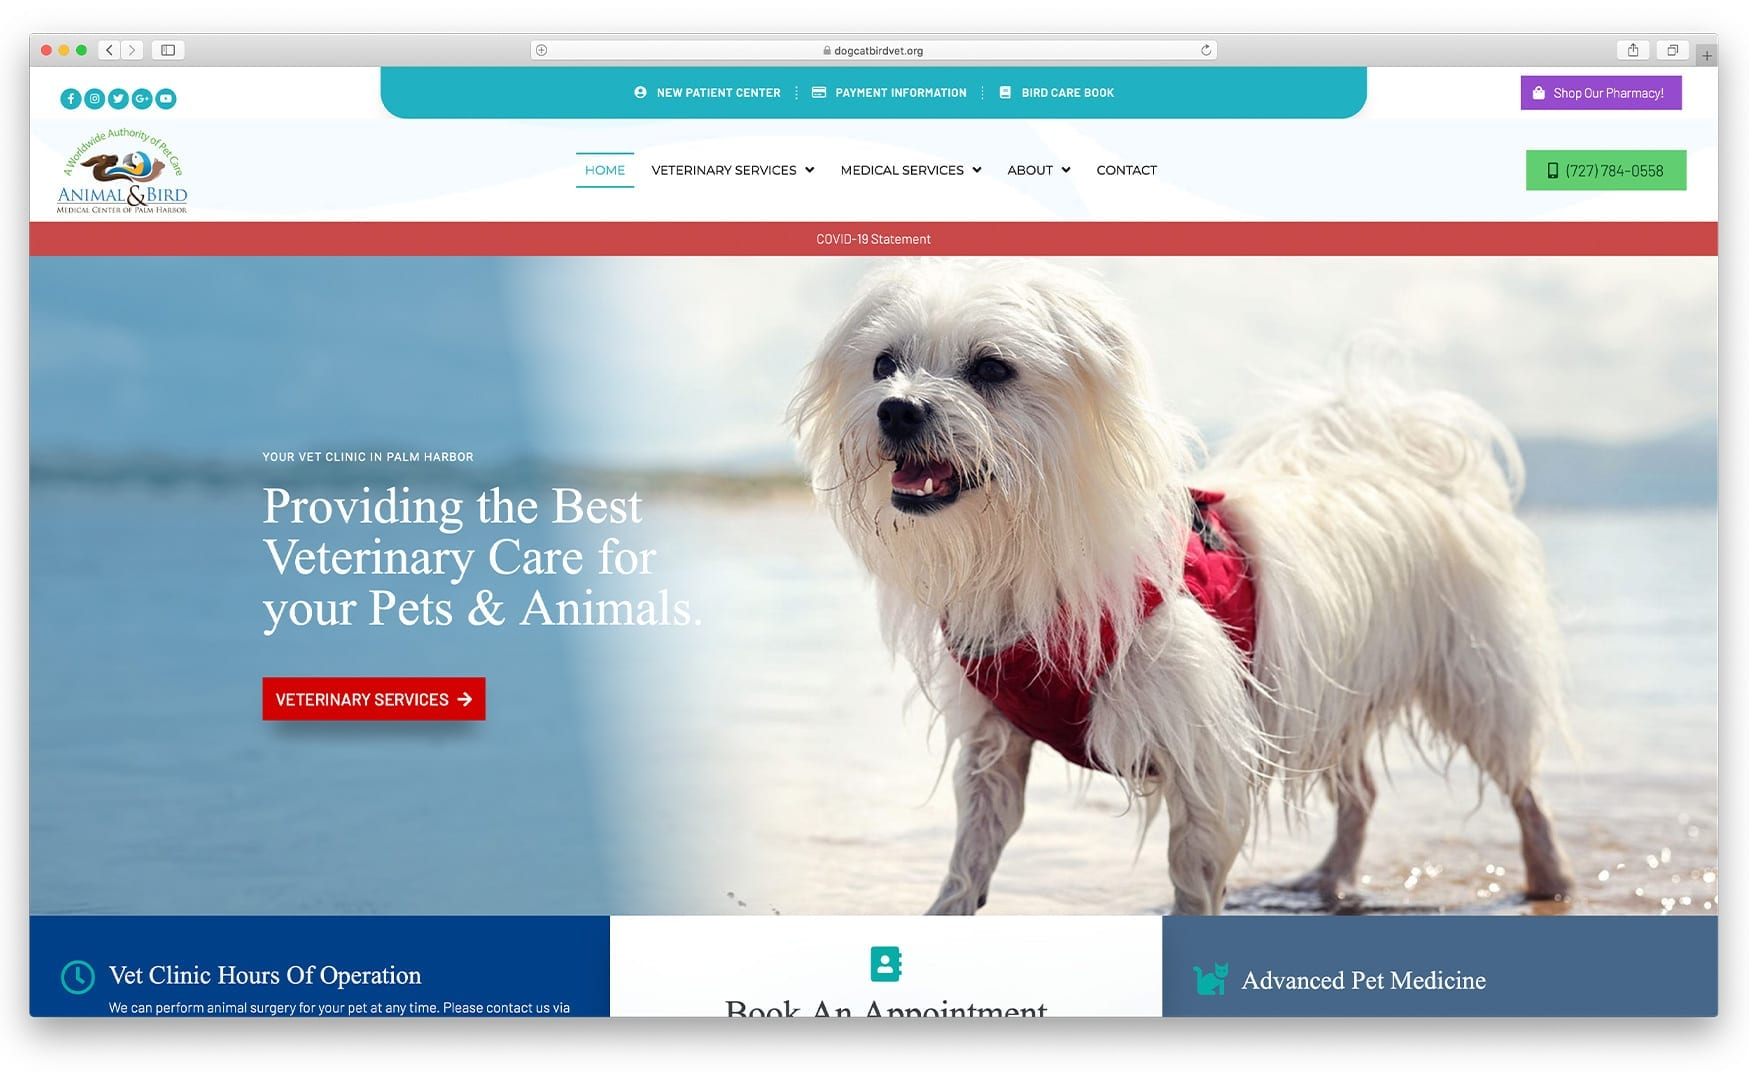 Animal & Bird Medical Center of Palm Harbor Website Design by sliStudios | Miami